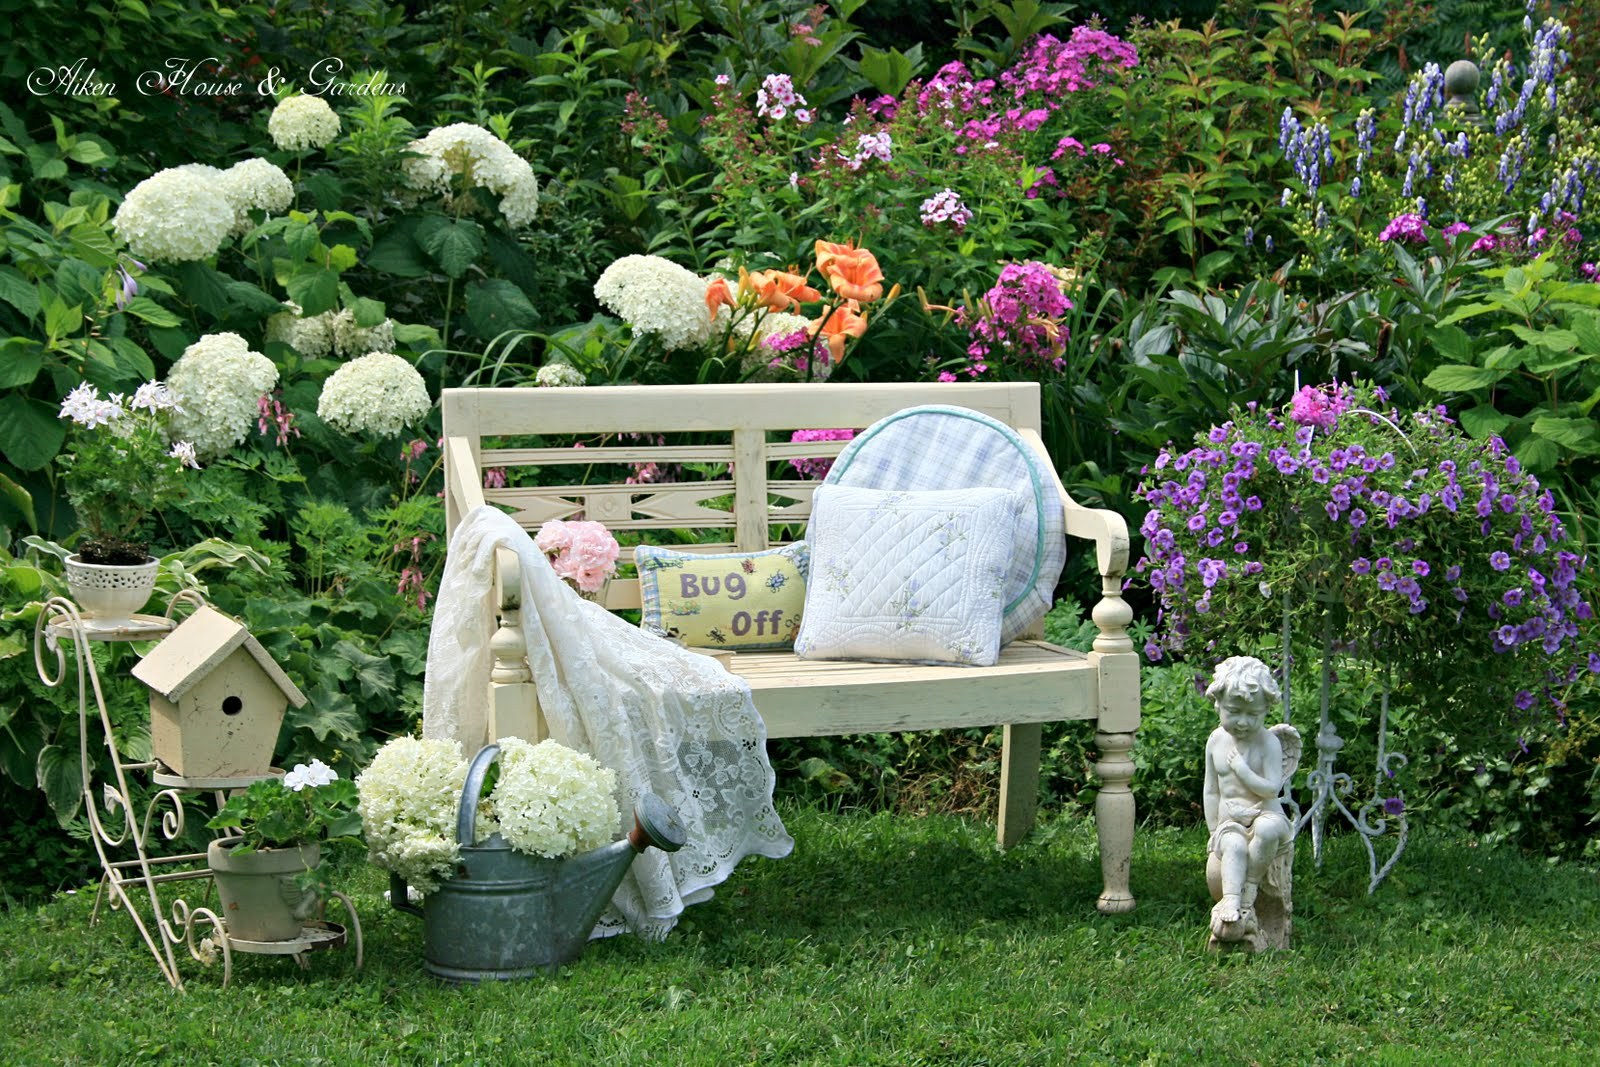 How To Pick A Front Door Color Aiken House Amp Gardens Our Romantic Garden